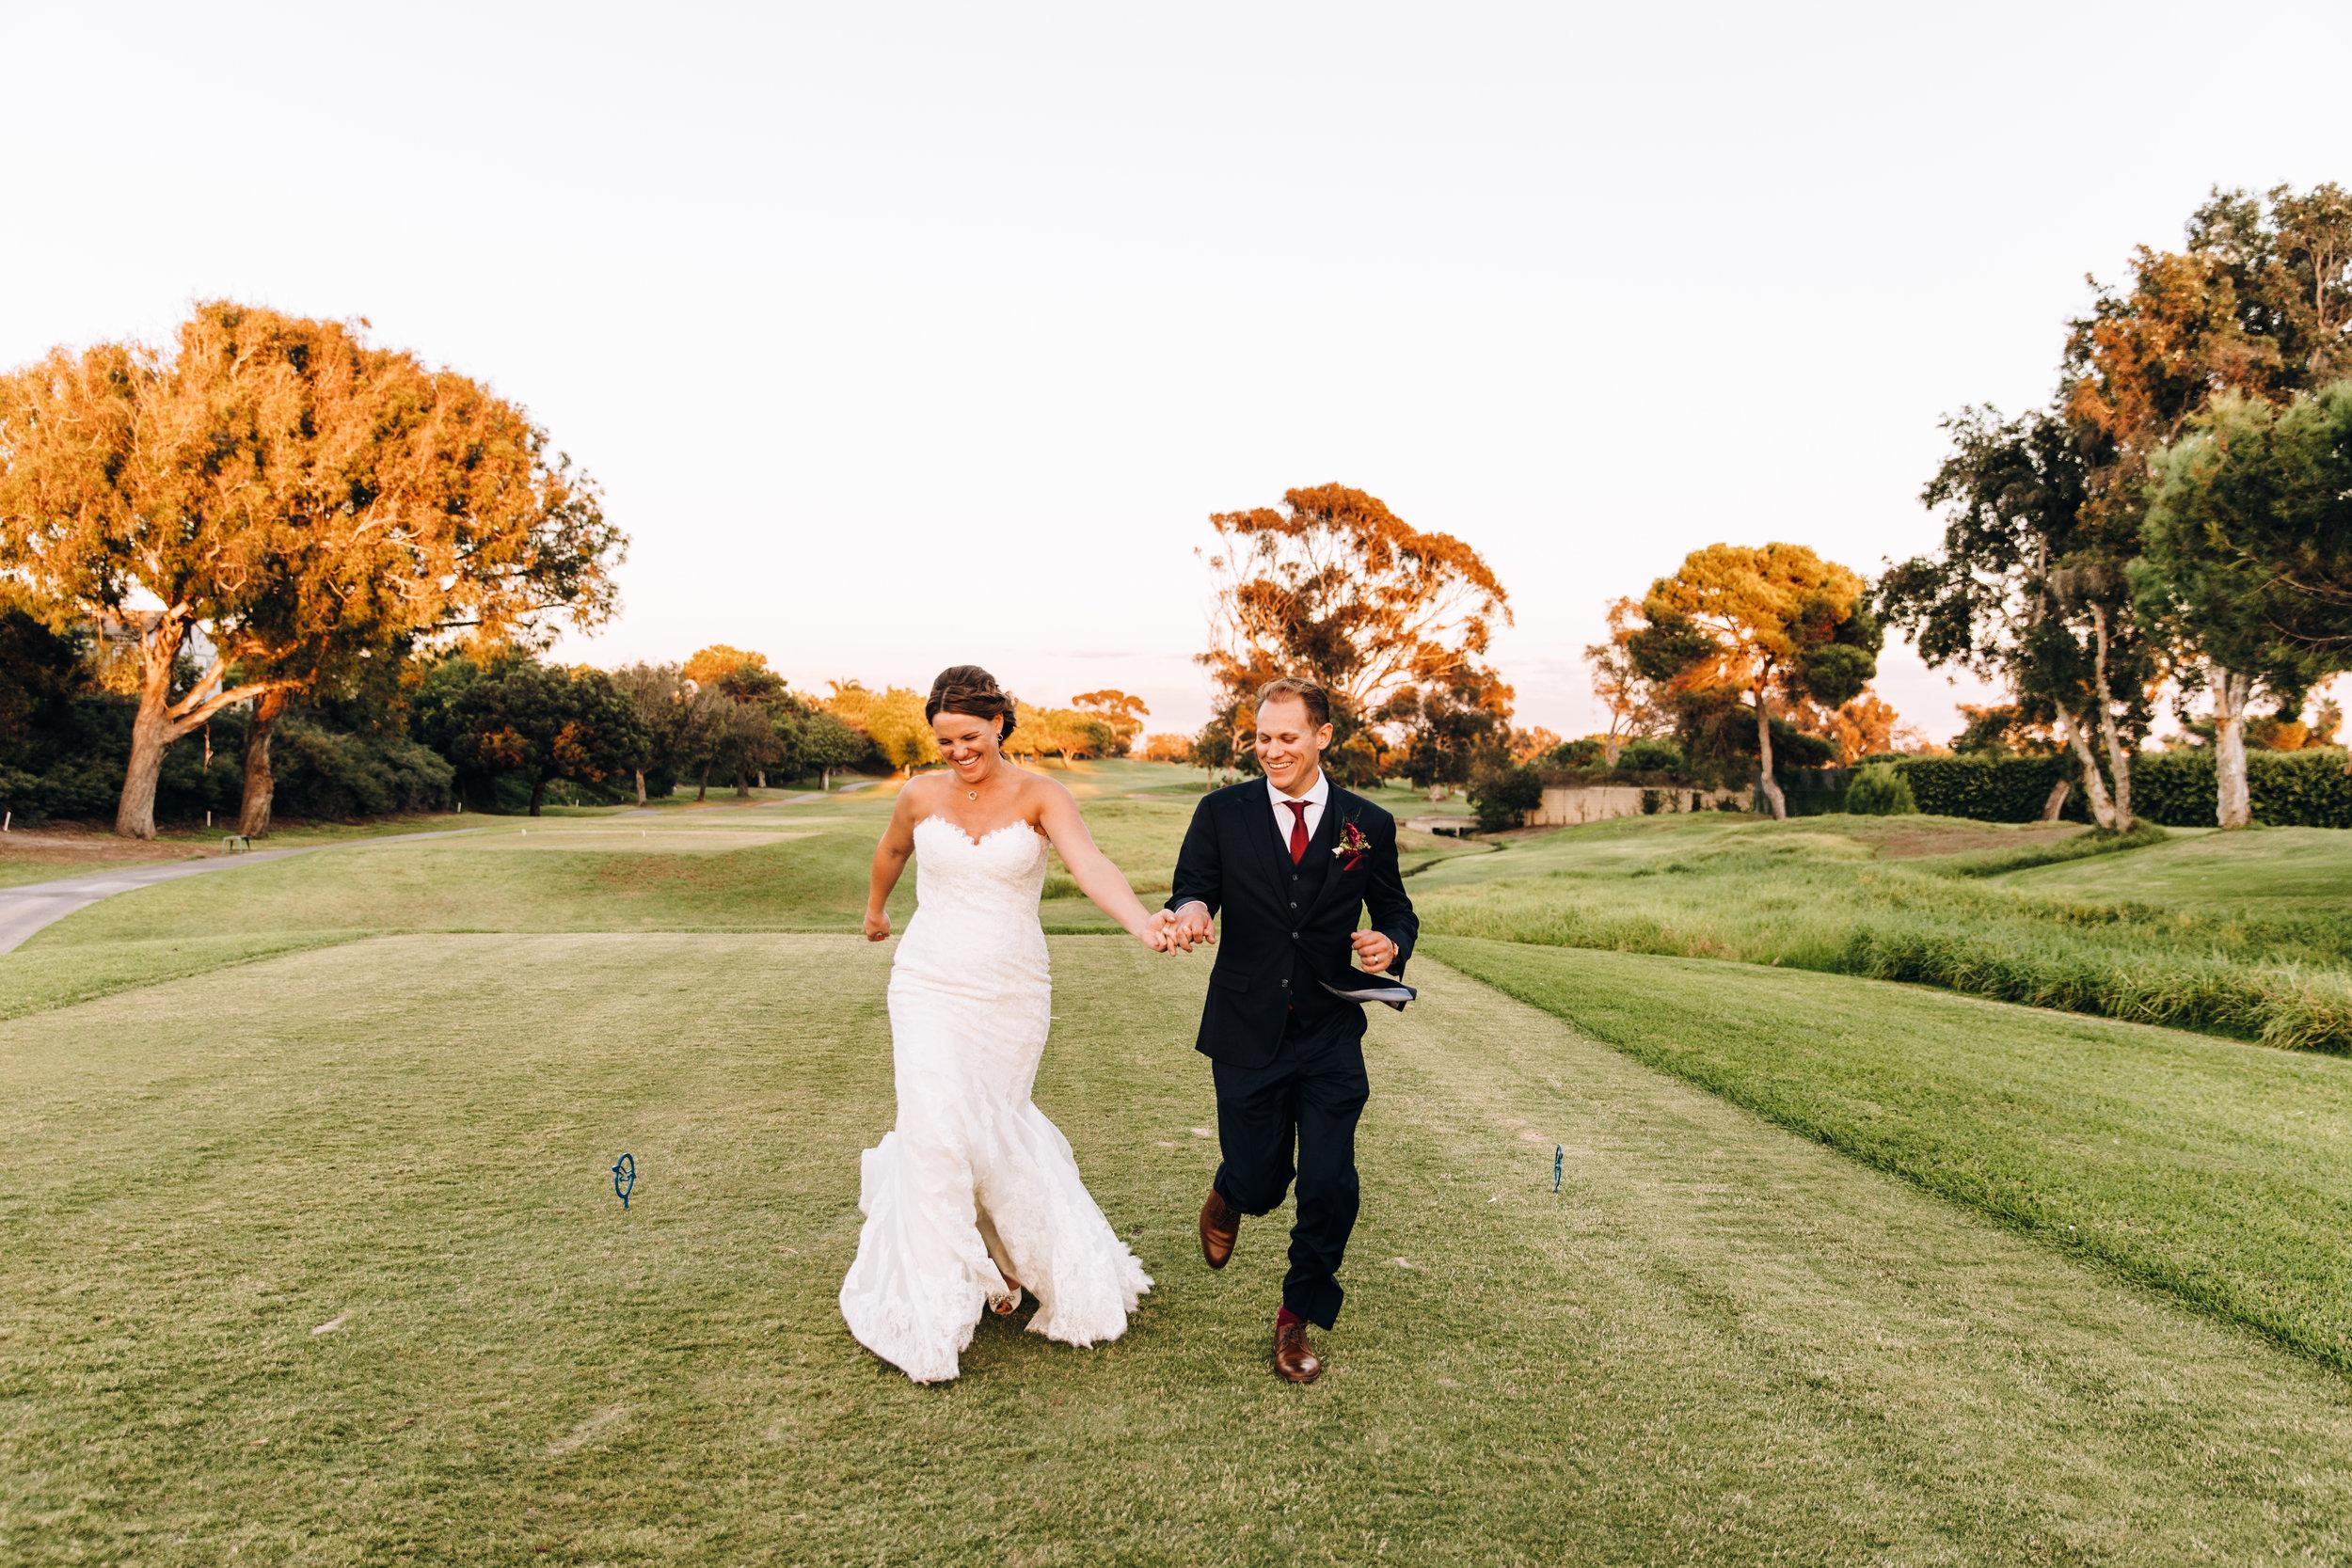 OC wedding photographer, Southern California wedding photographer, Orange County wedding photographer, SoCal wedding photographer, Huntington Beach wedding photographer, Seacliff wedding photographer